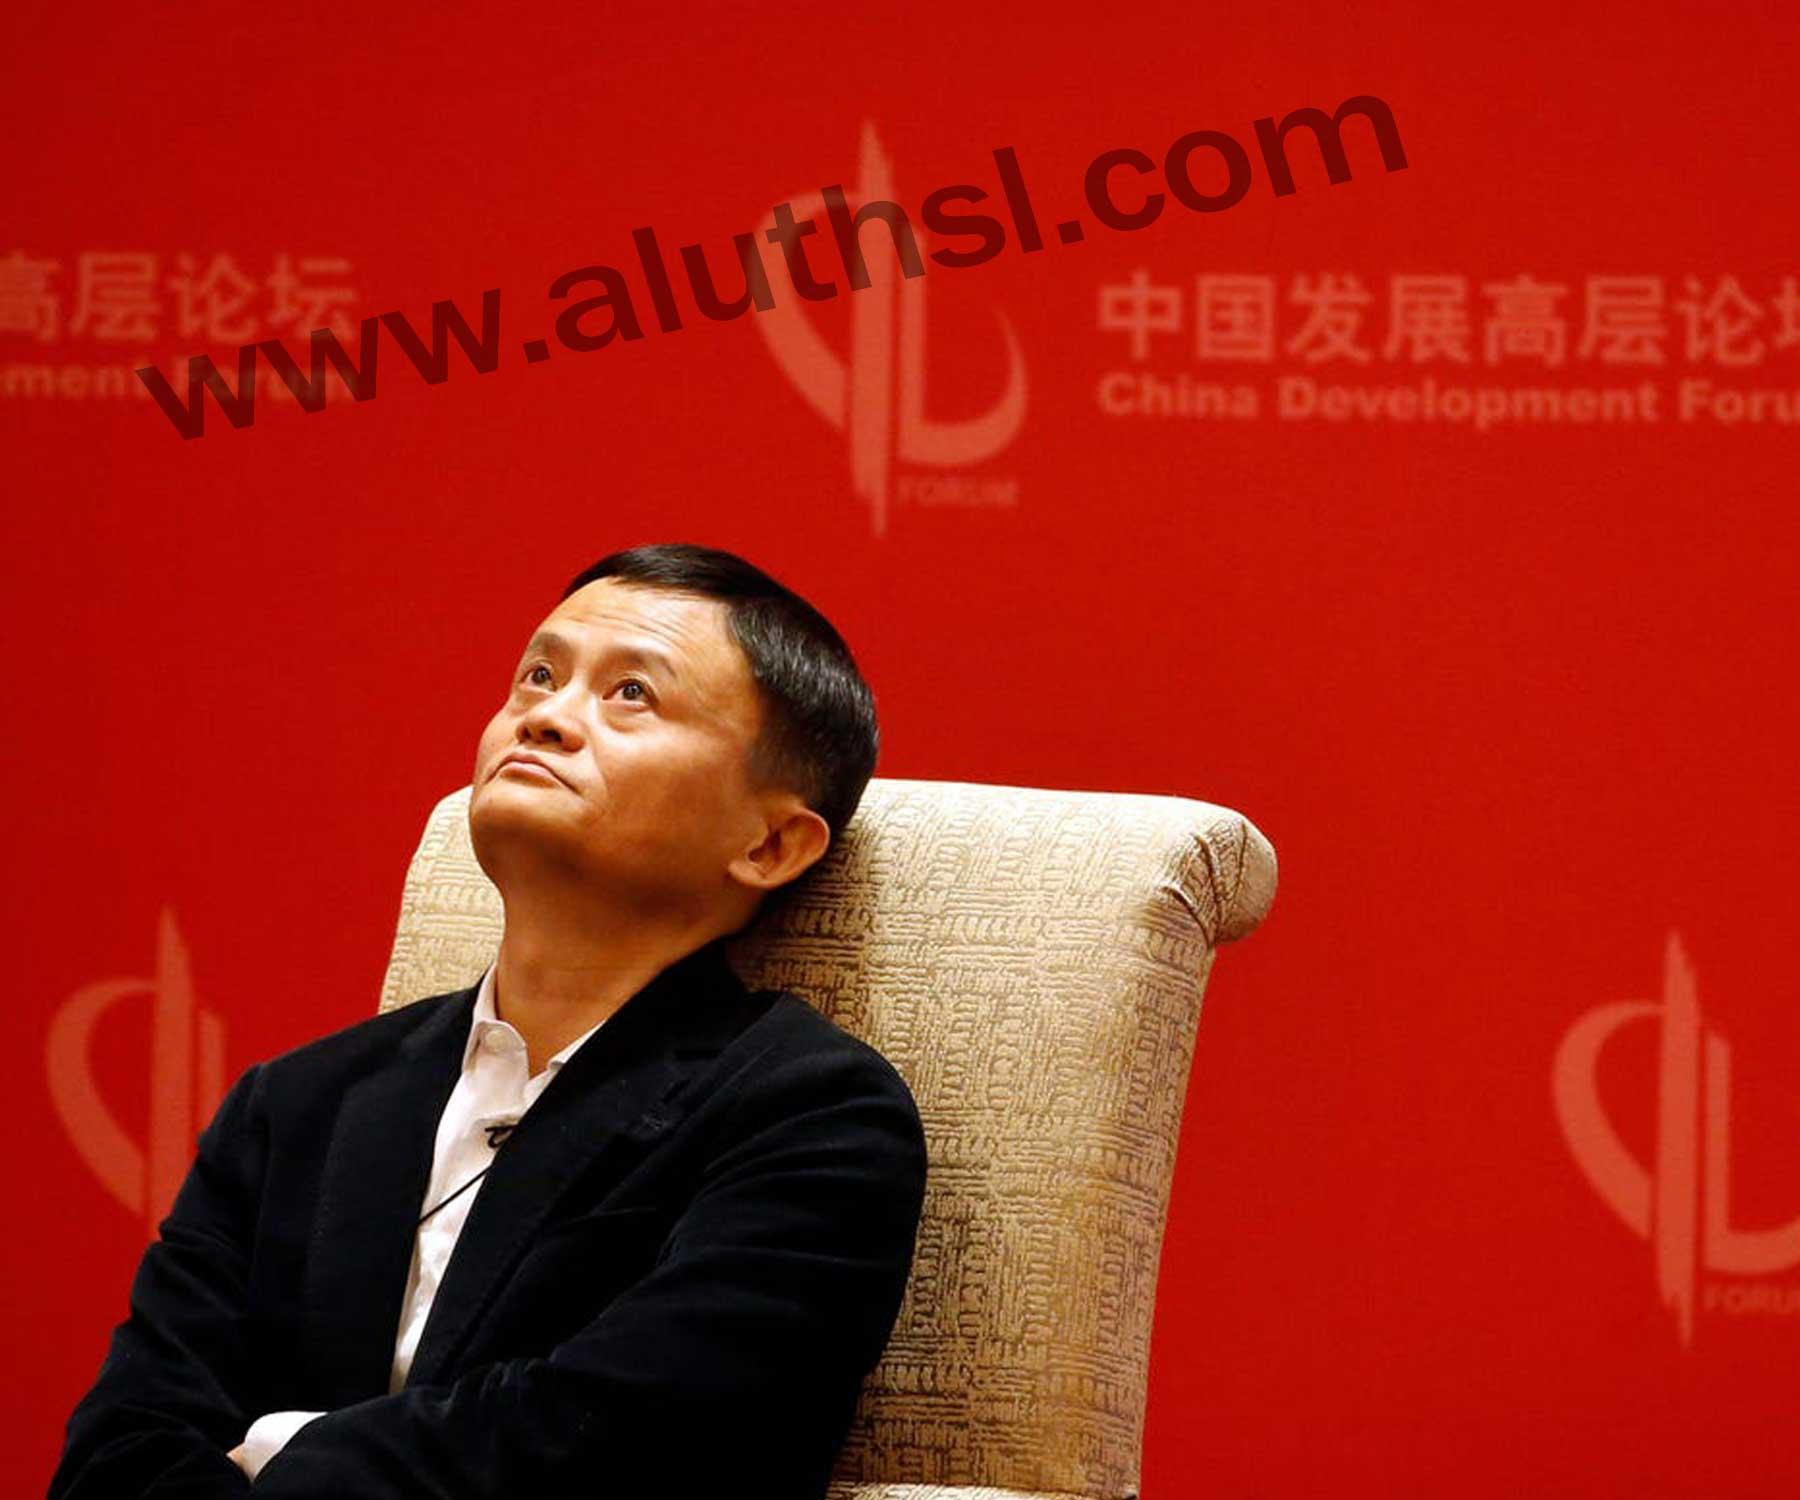 Alibaba සමාගම ඇතුලුව තවත් සමාගම් 22 කට දඩ